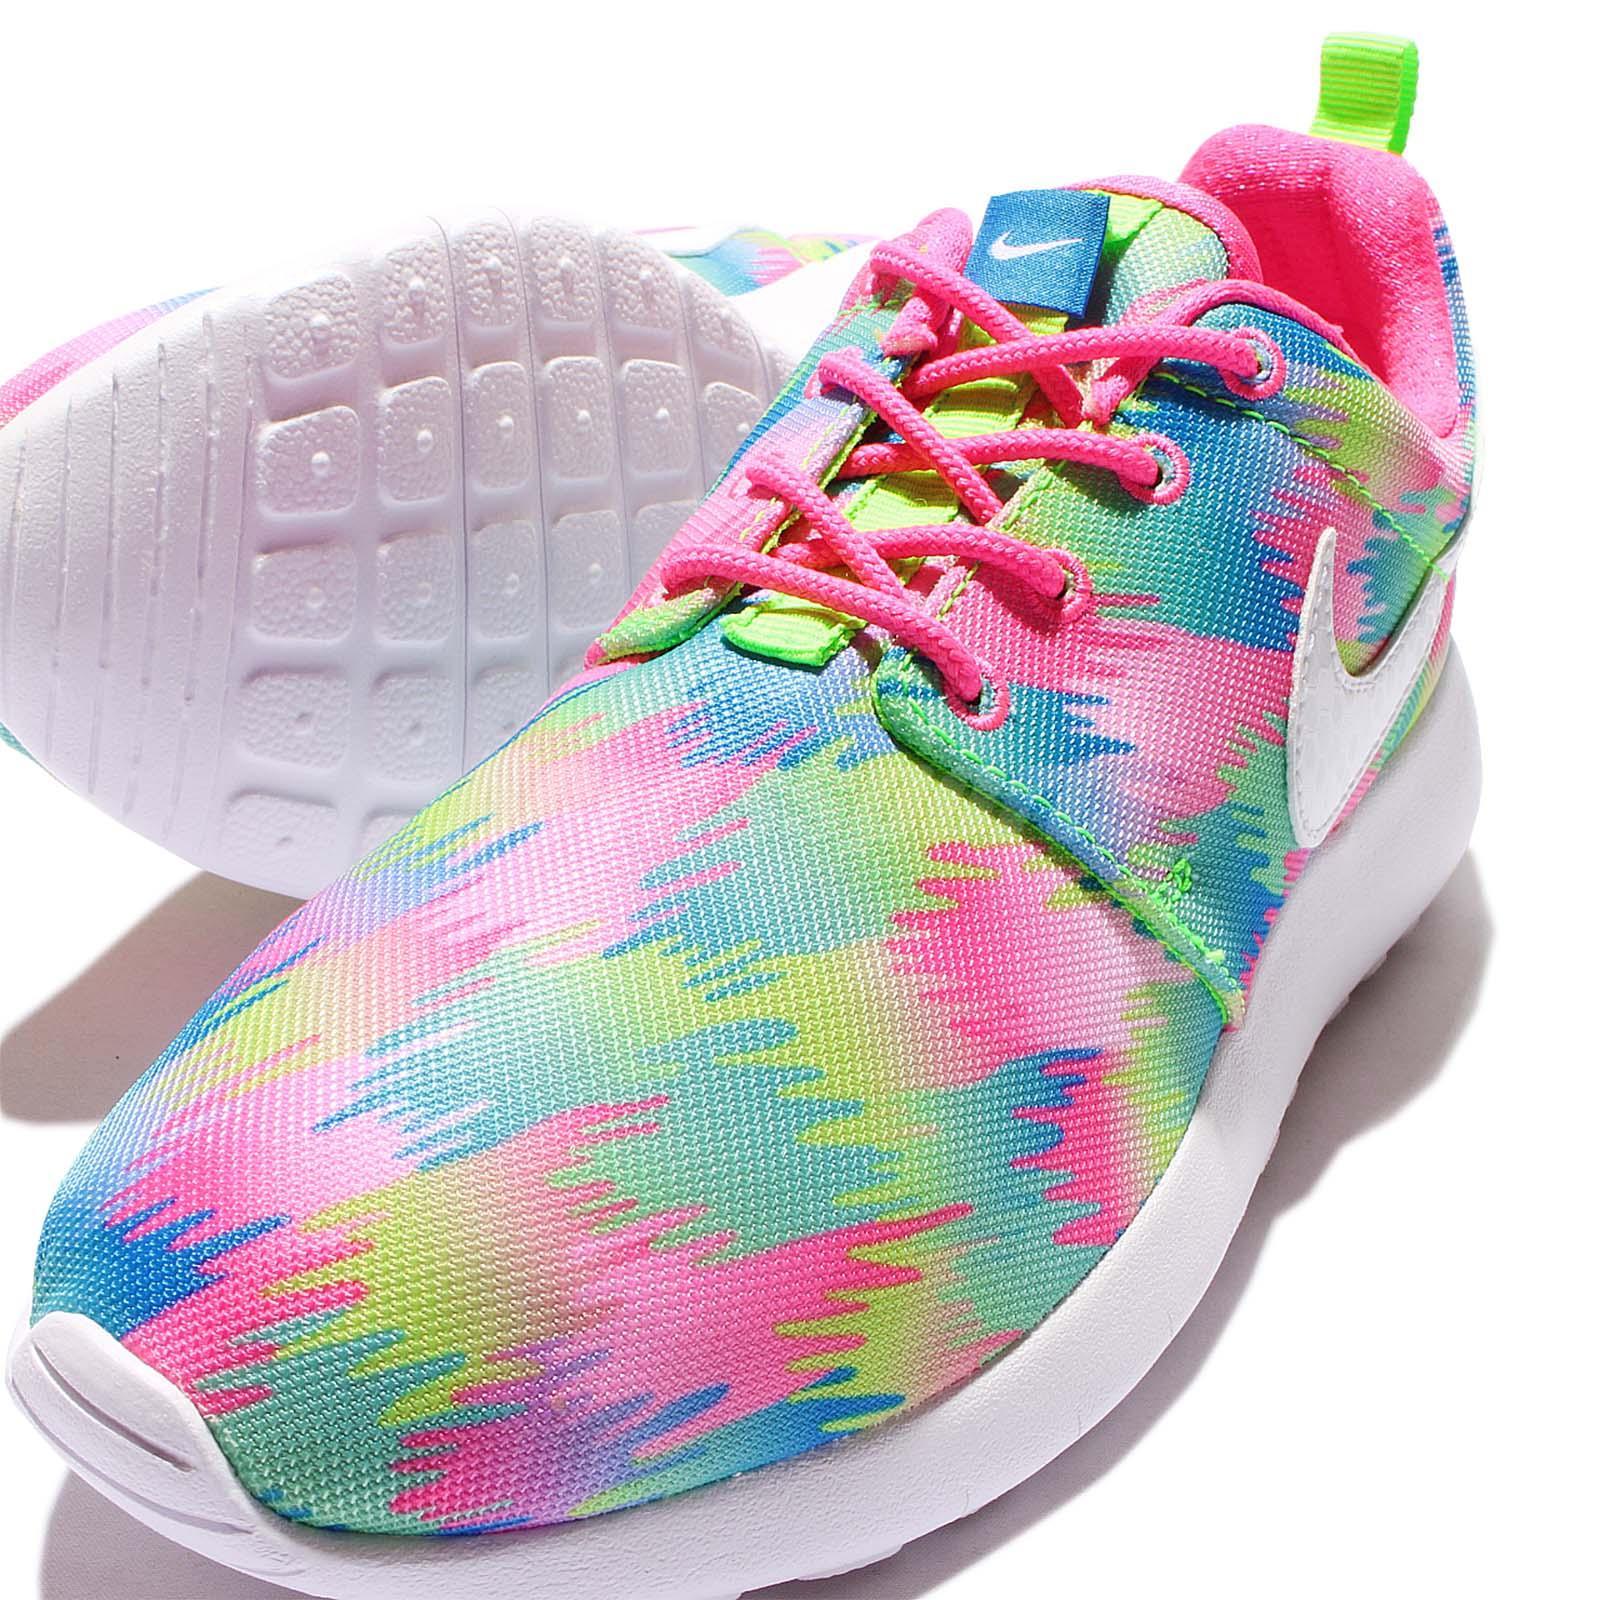 ... nike roshe one print gs multi color rosherun kids youth running